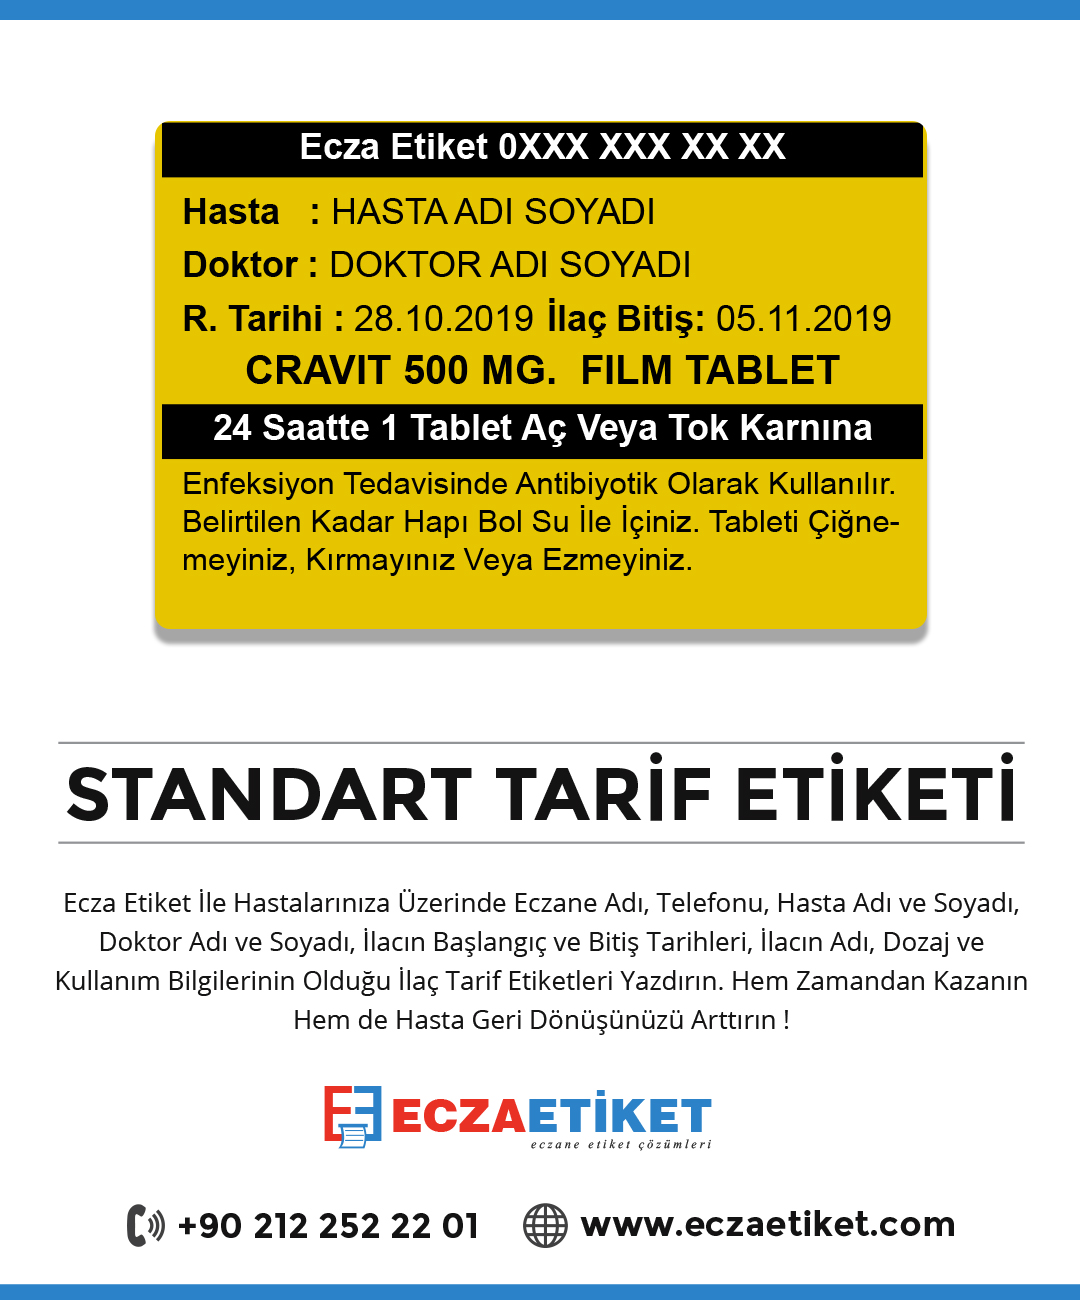 STANDART-TARİF-ETİKET.jpg